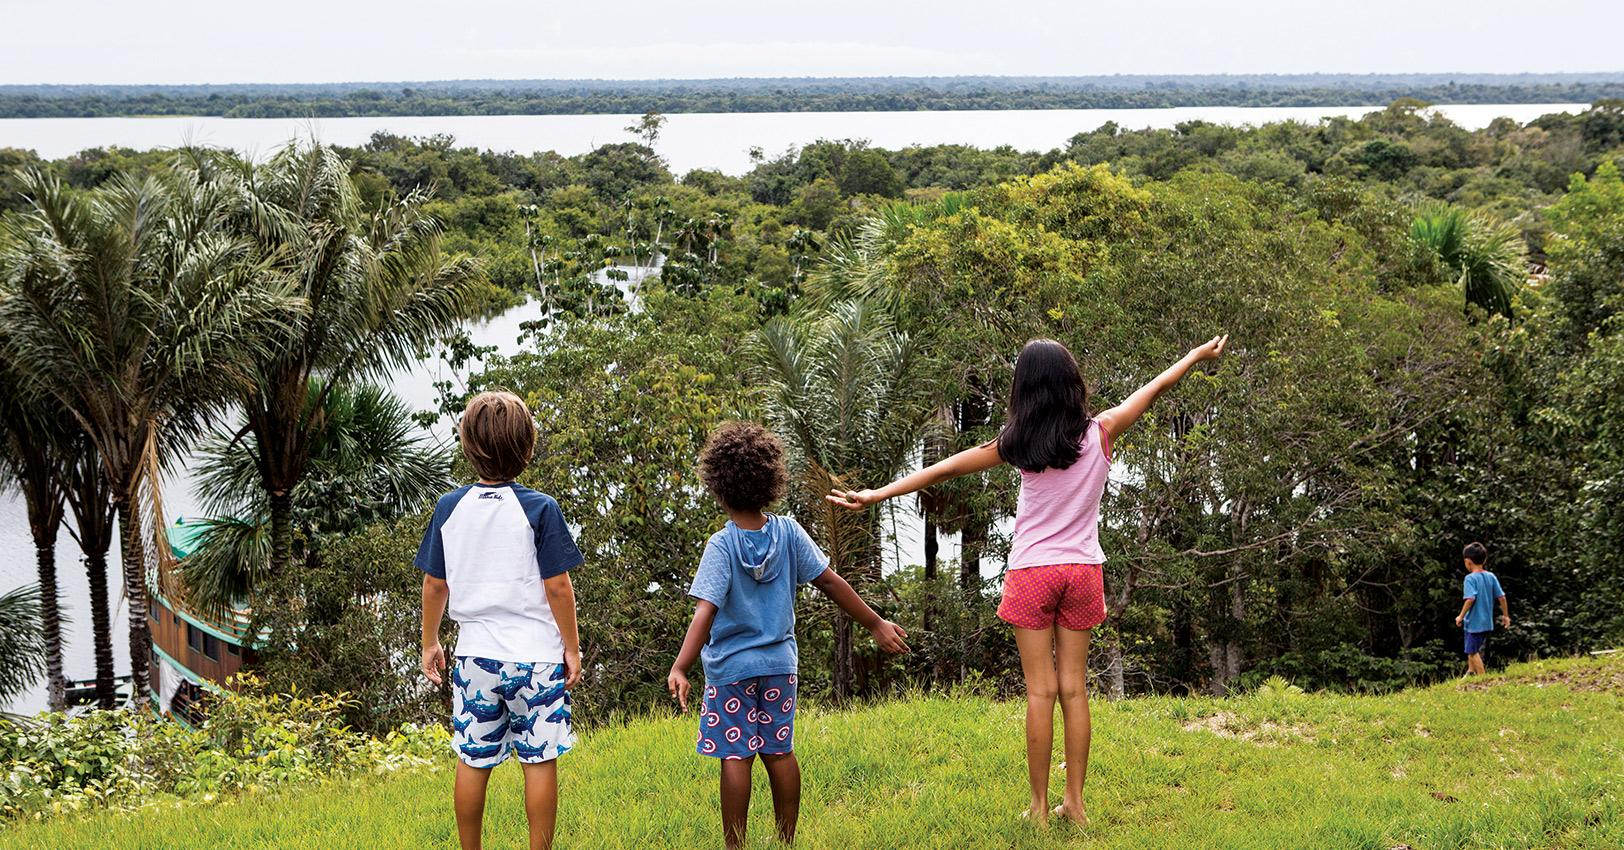 OurWholeVillage-Appreciating-the-magnitude-and-abundance-of-the-Amazon-1526397684479.jpg